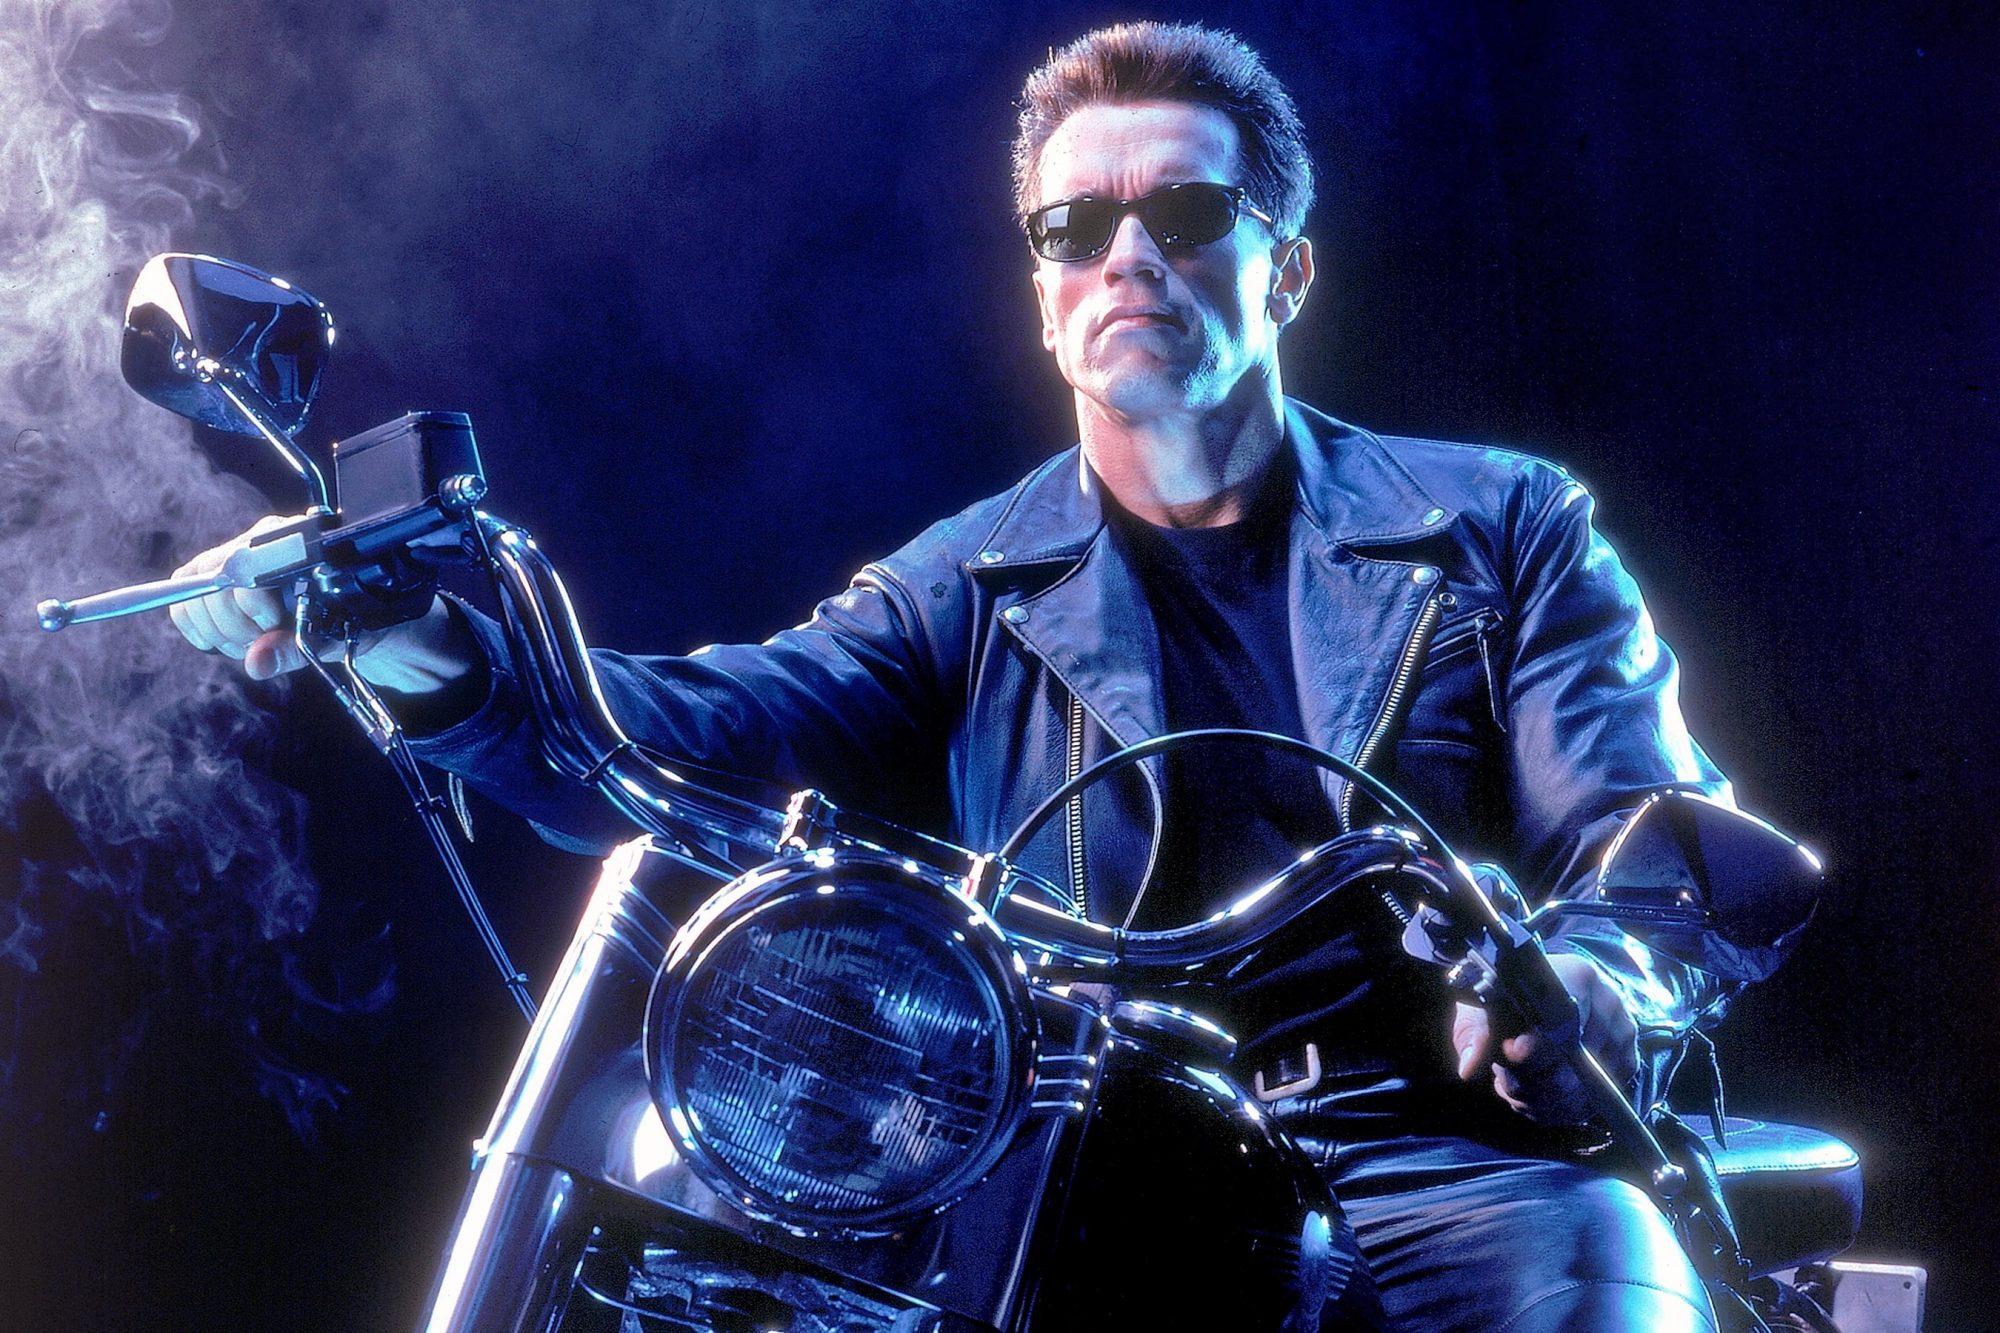 TERMINATOR 2: JUDGMENT DAY (1991)Arnold Schwarzenegger